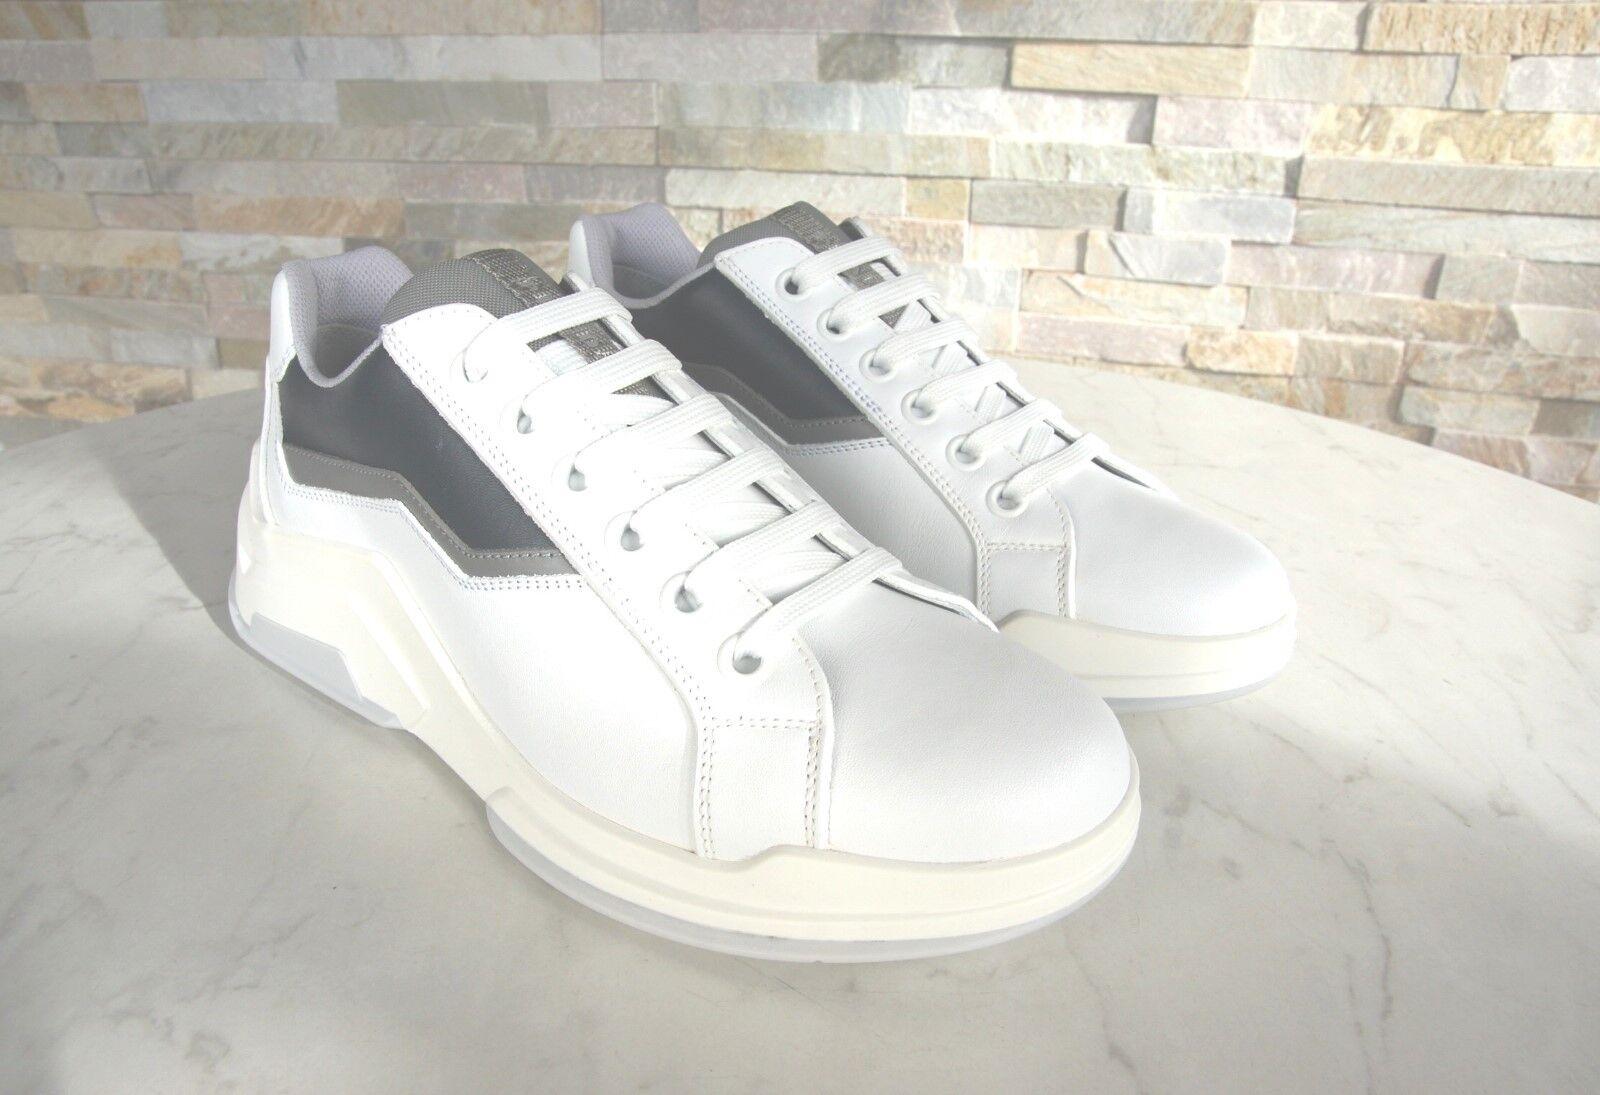 1ddb5a3e6540f5 ... New Nike Air Jordan XV XV XV 15 Metallic Size 12 136035 011 RARE  Original Not ...